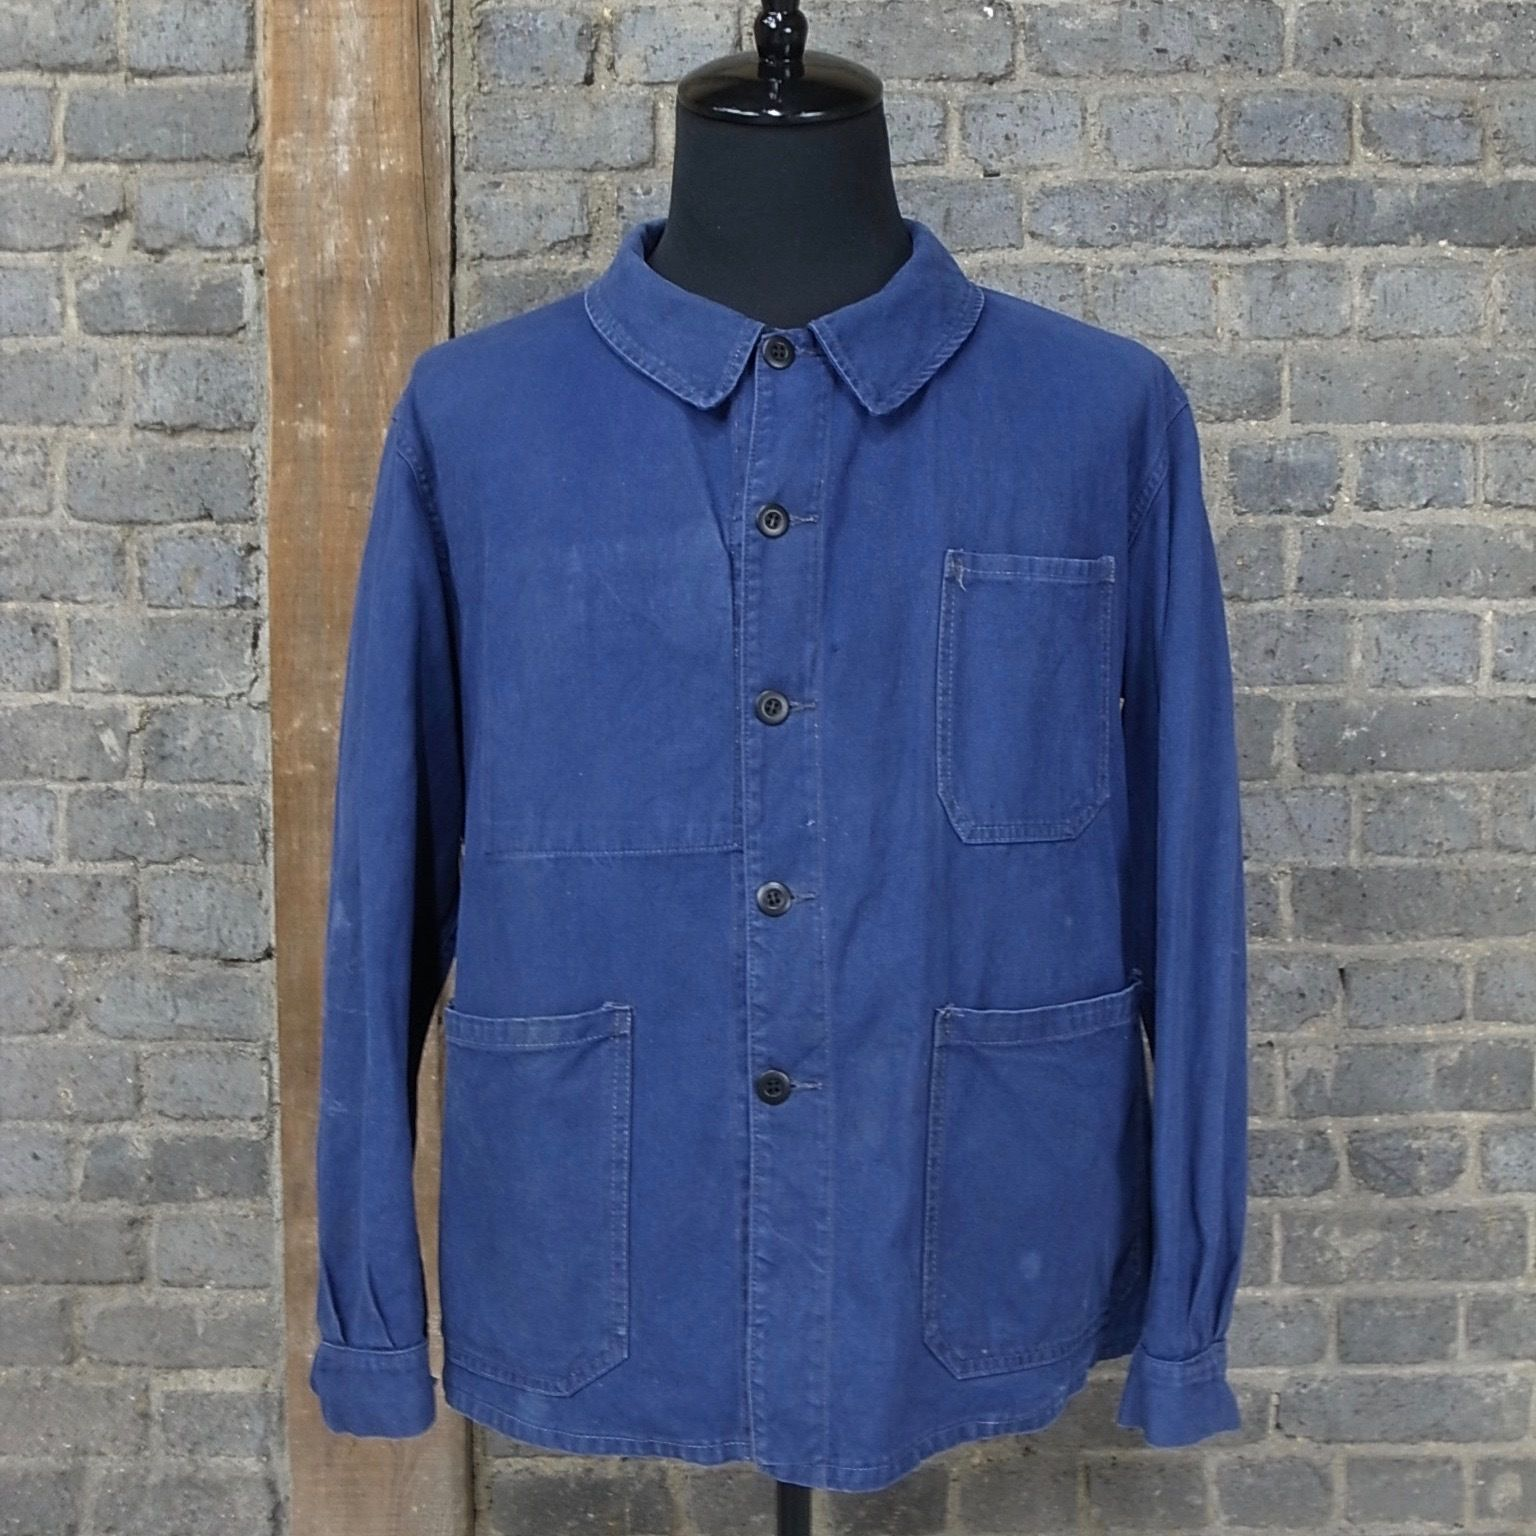 mid 20th c. french vintage cotton twil marine  work jacket